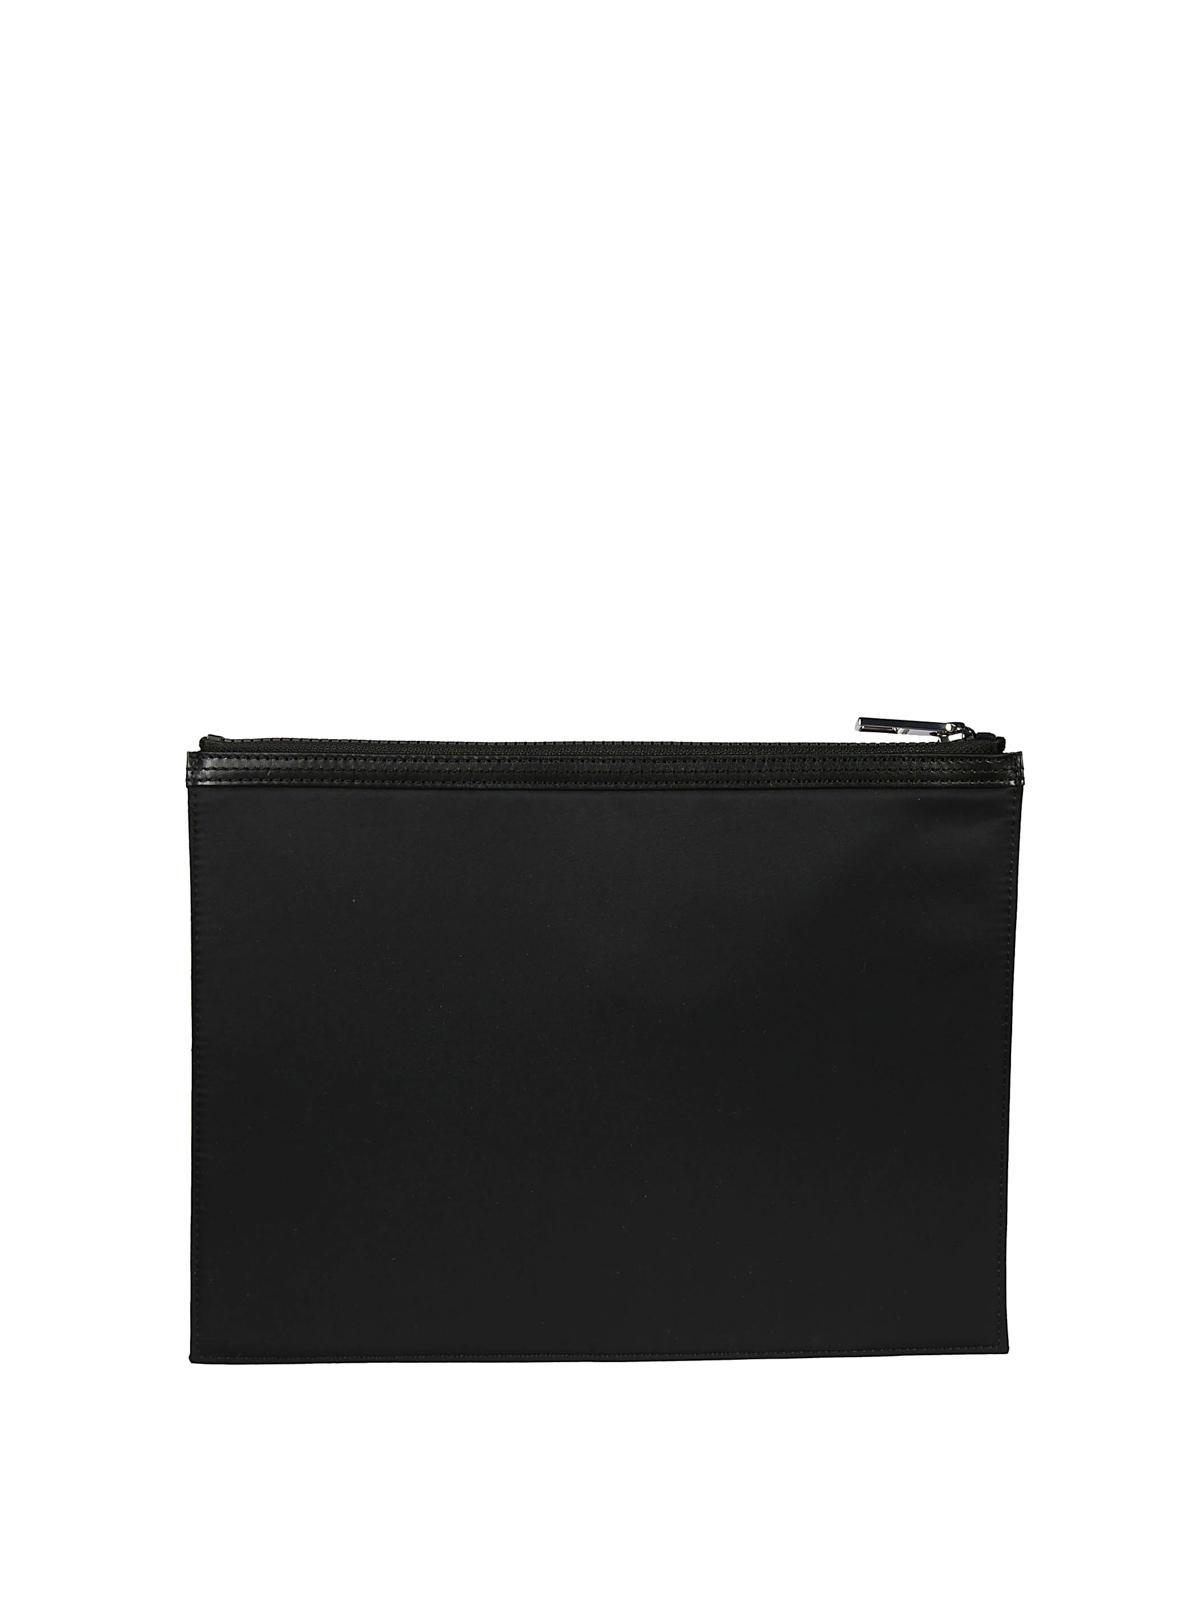 5bc8cc6770 Kenzo - A4 Kenzo Paris zipped nylon clutch - clutches - F855PM202F2499